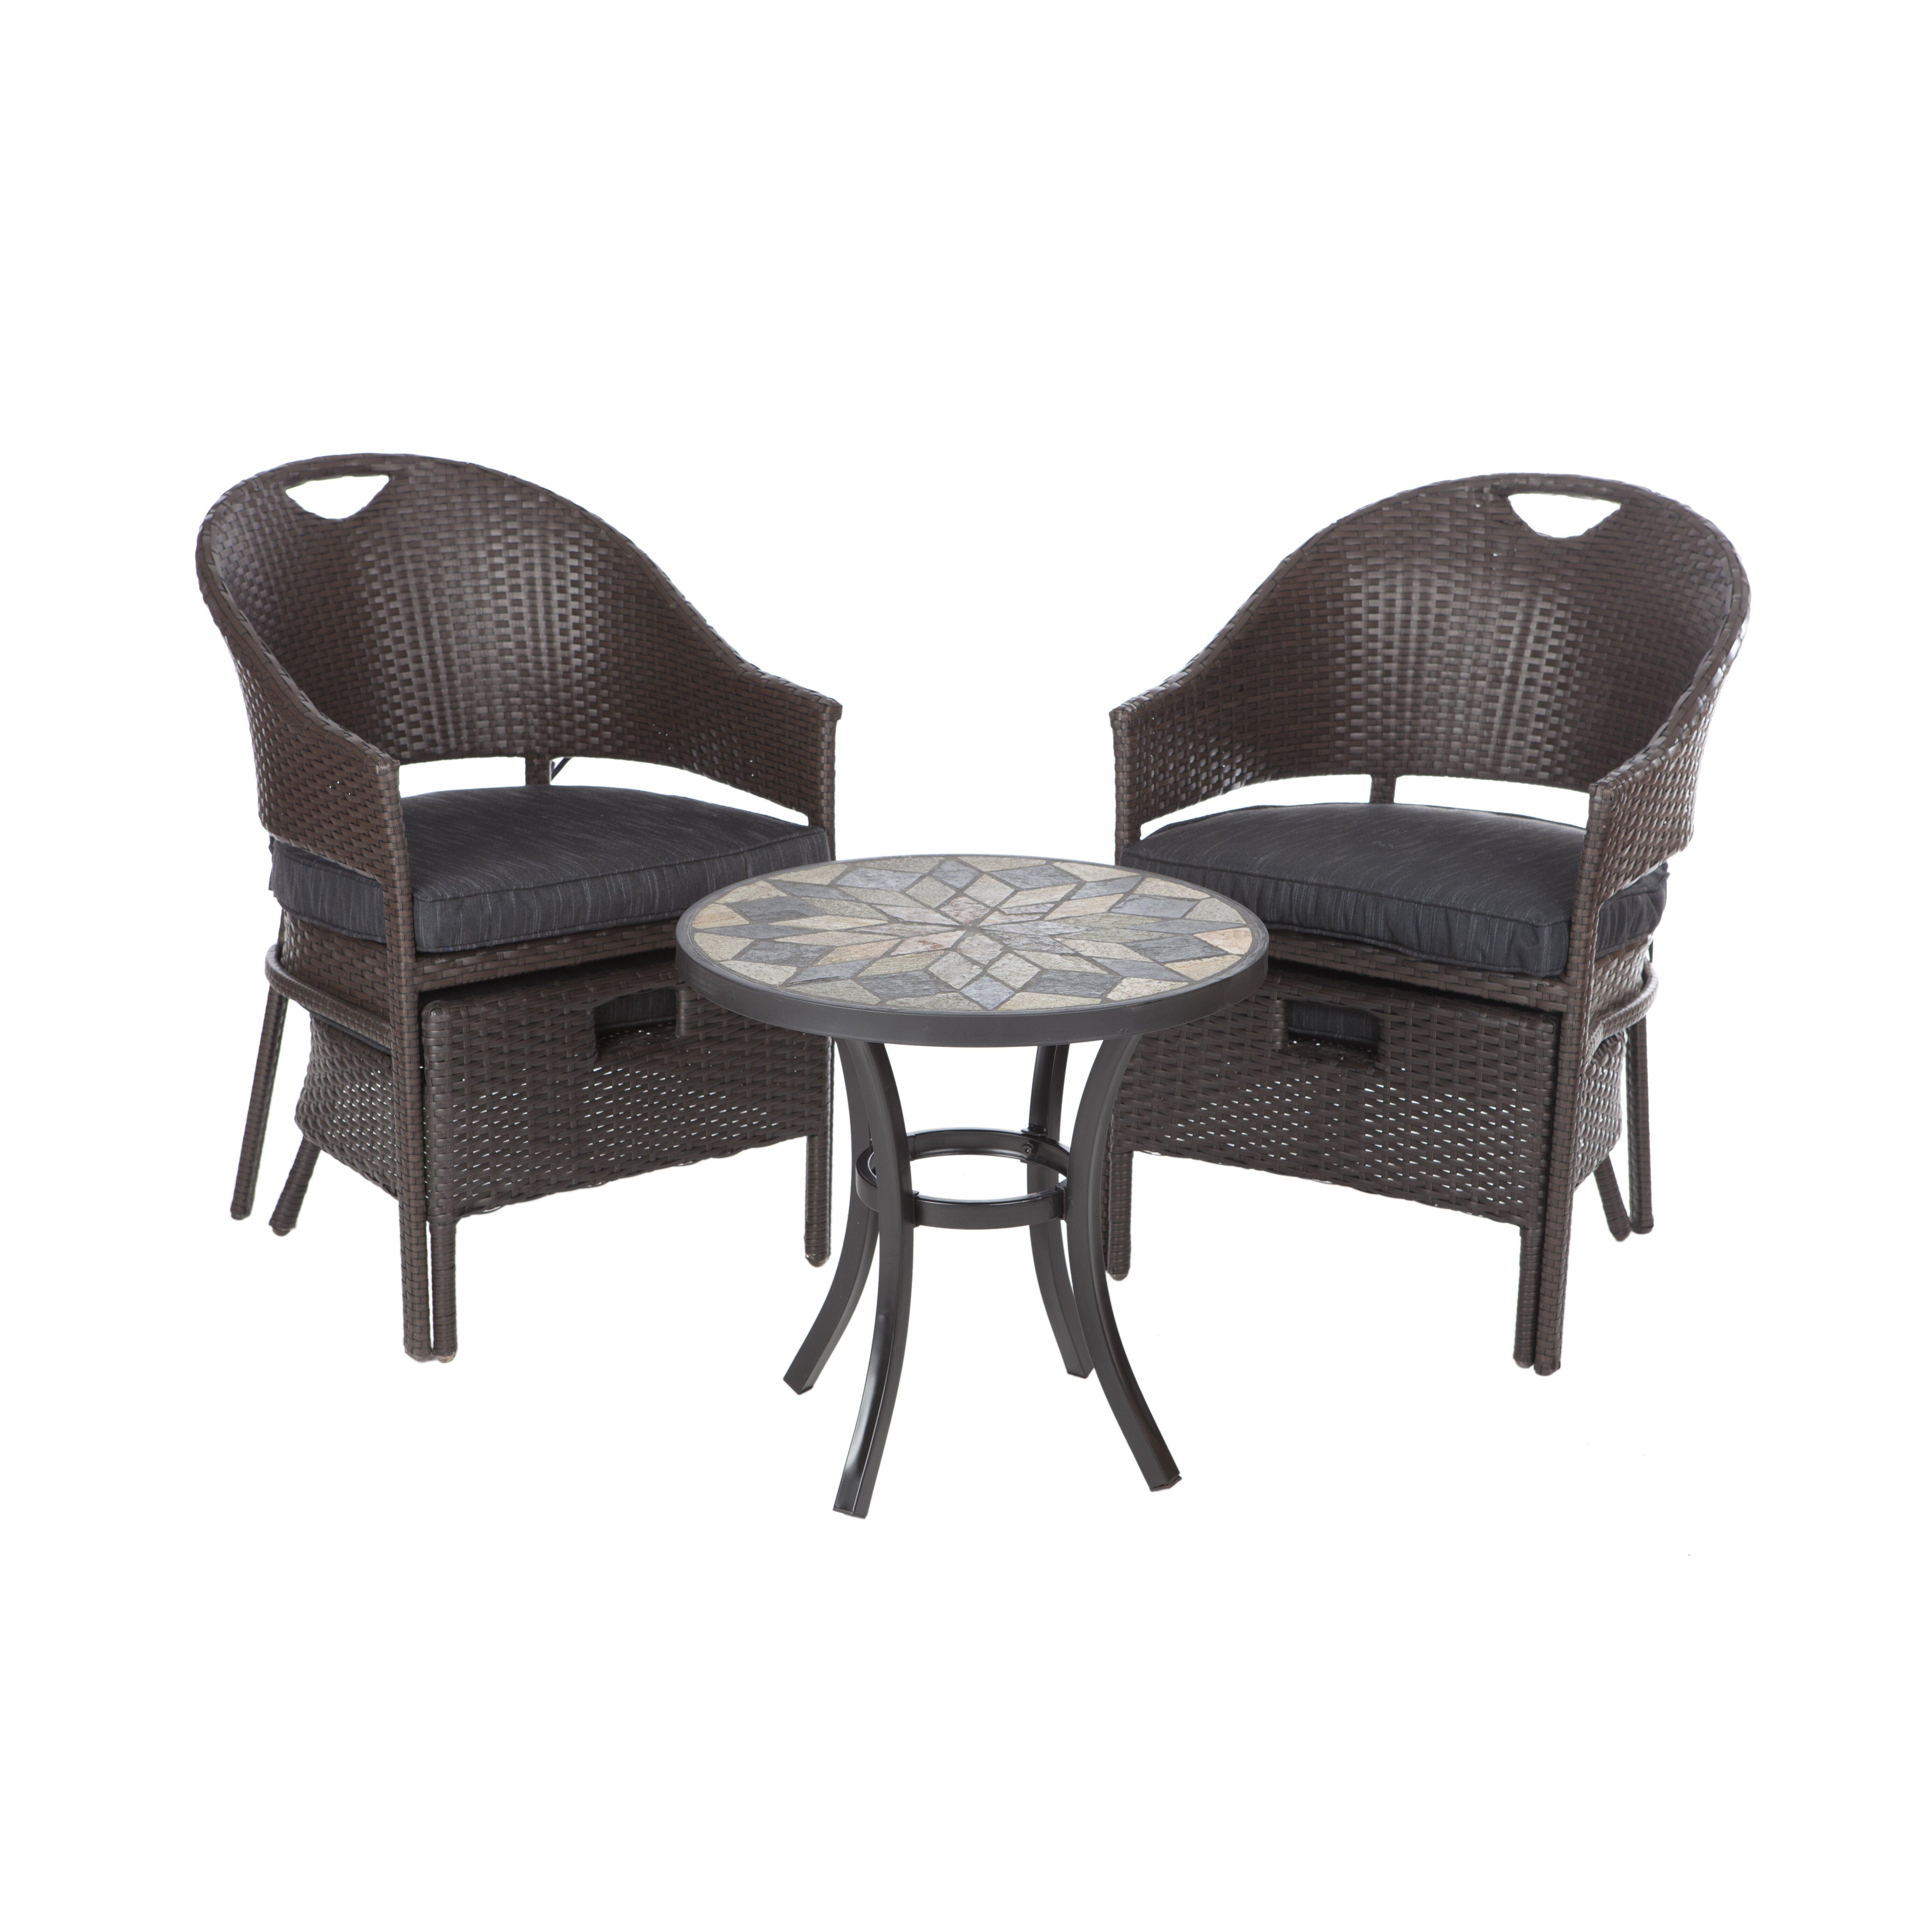 100 furniture best agio patio furniture veranda agio outdoor woven chaise lounge by